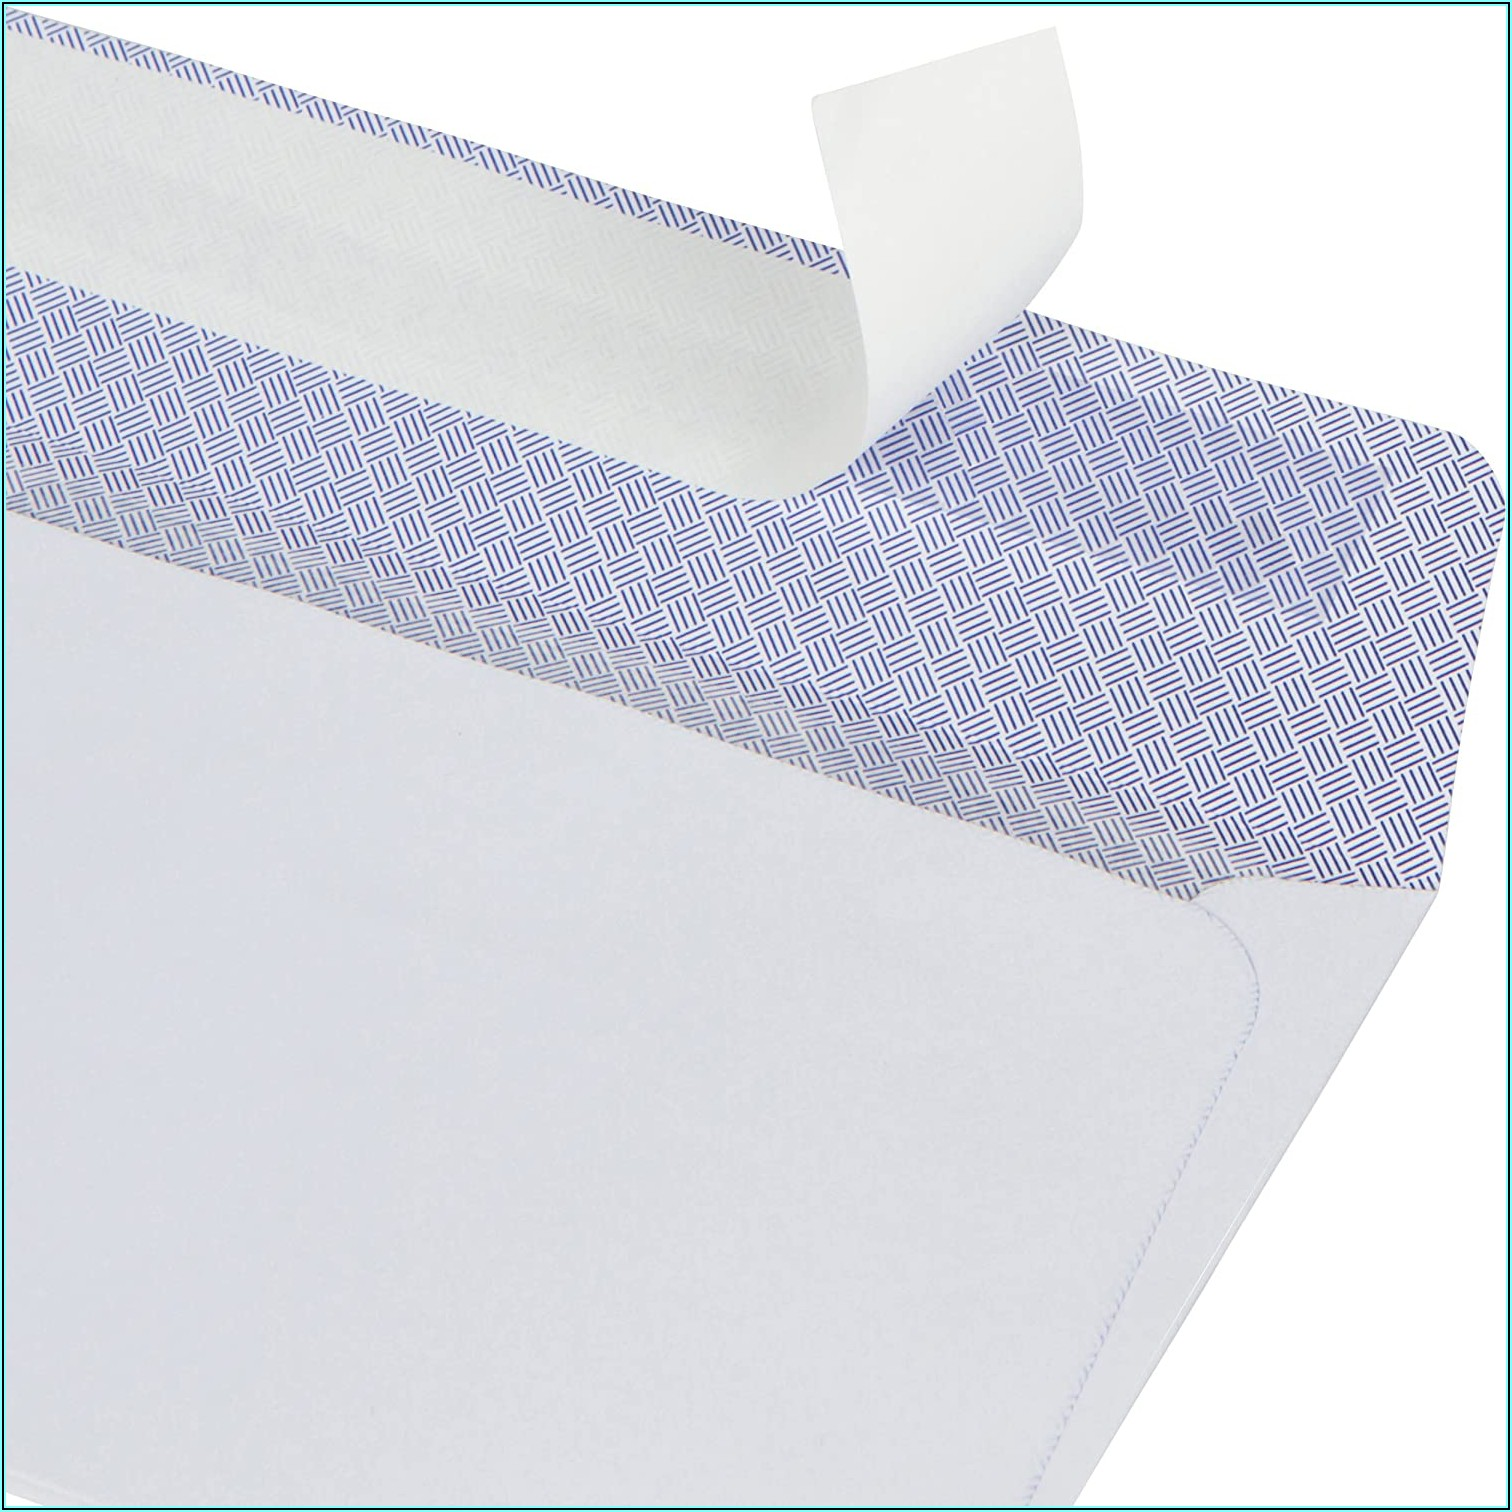 Double Window Envelopes For Quickbooks Checks